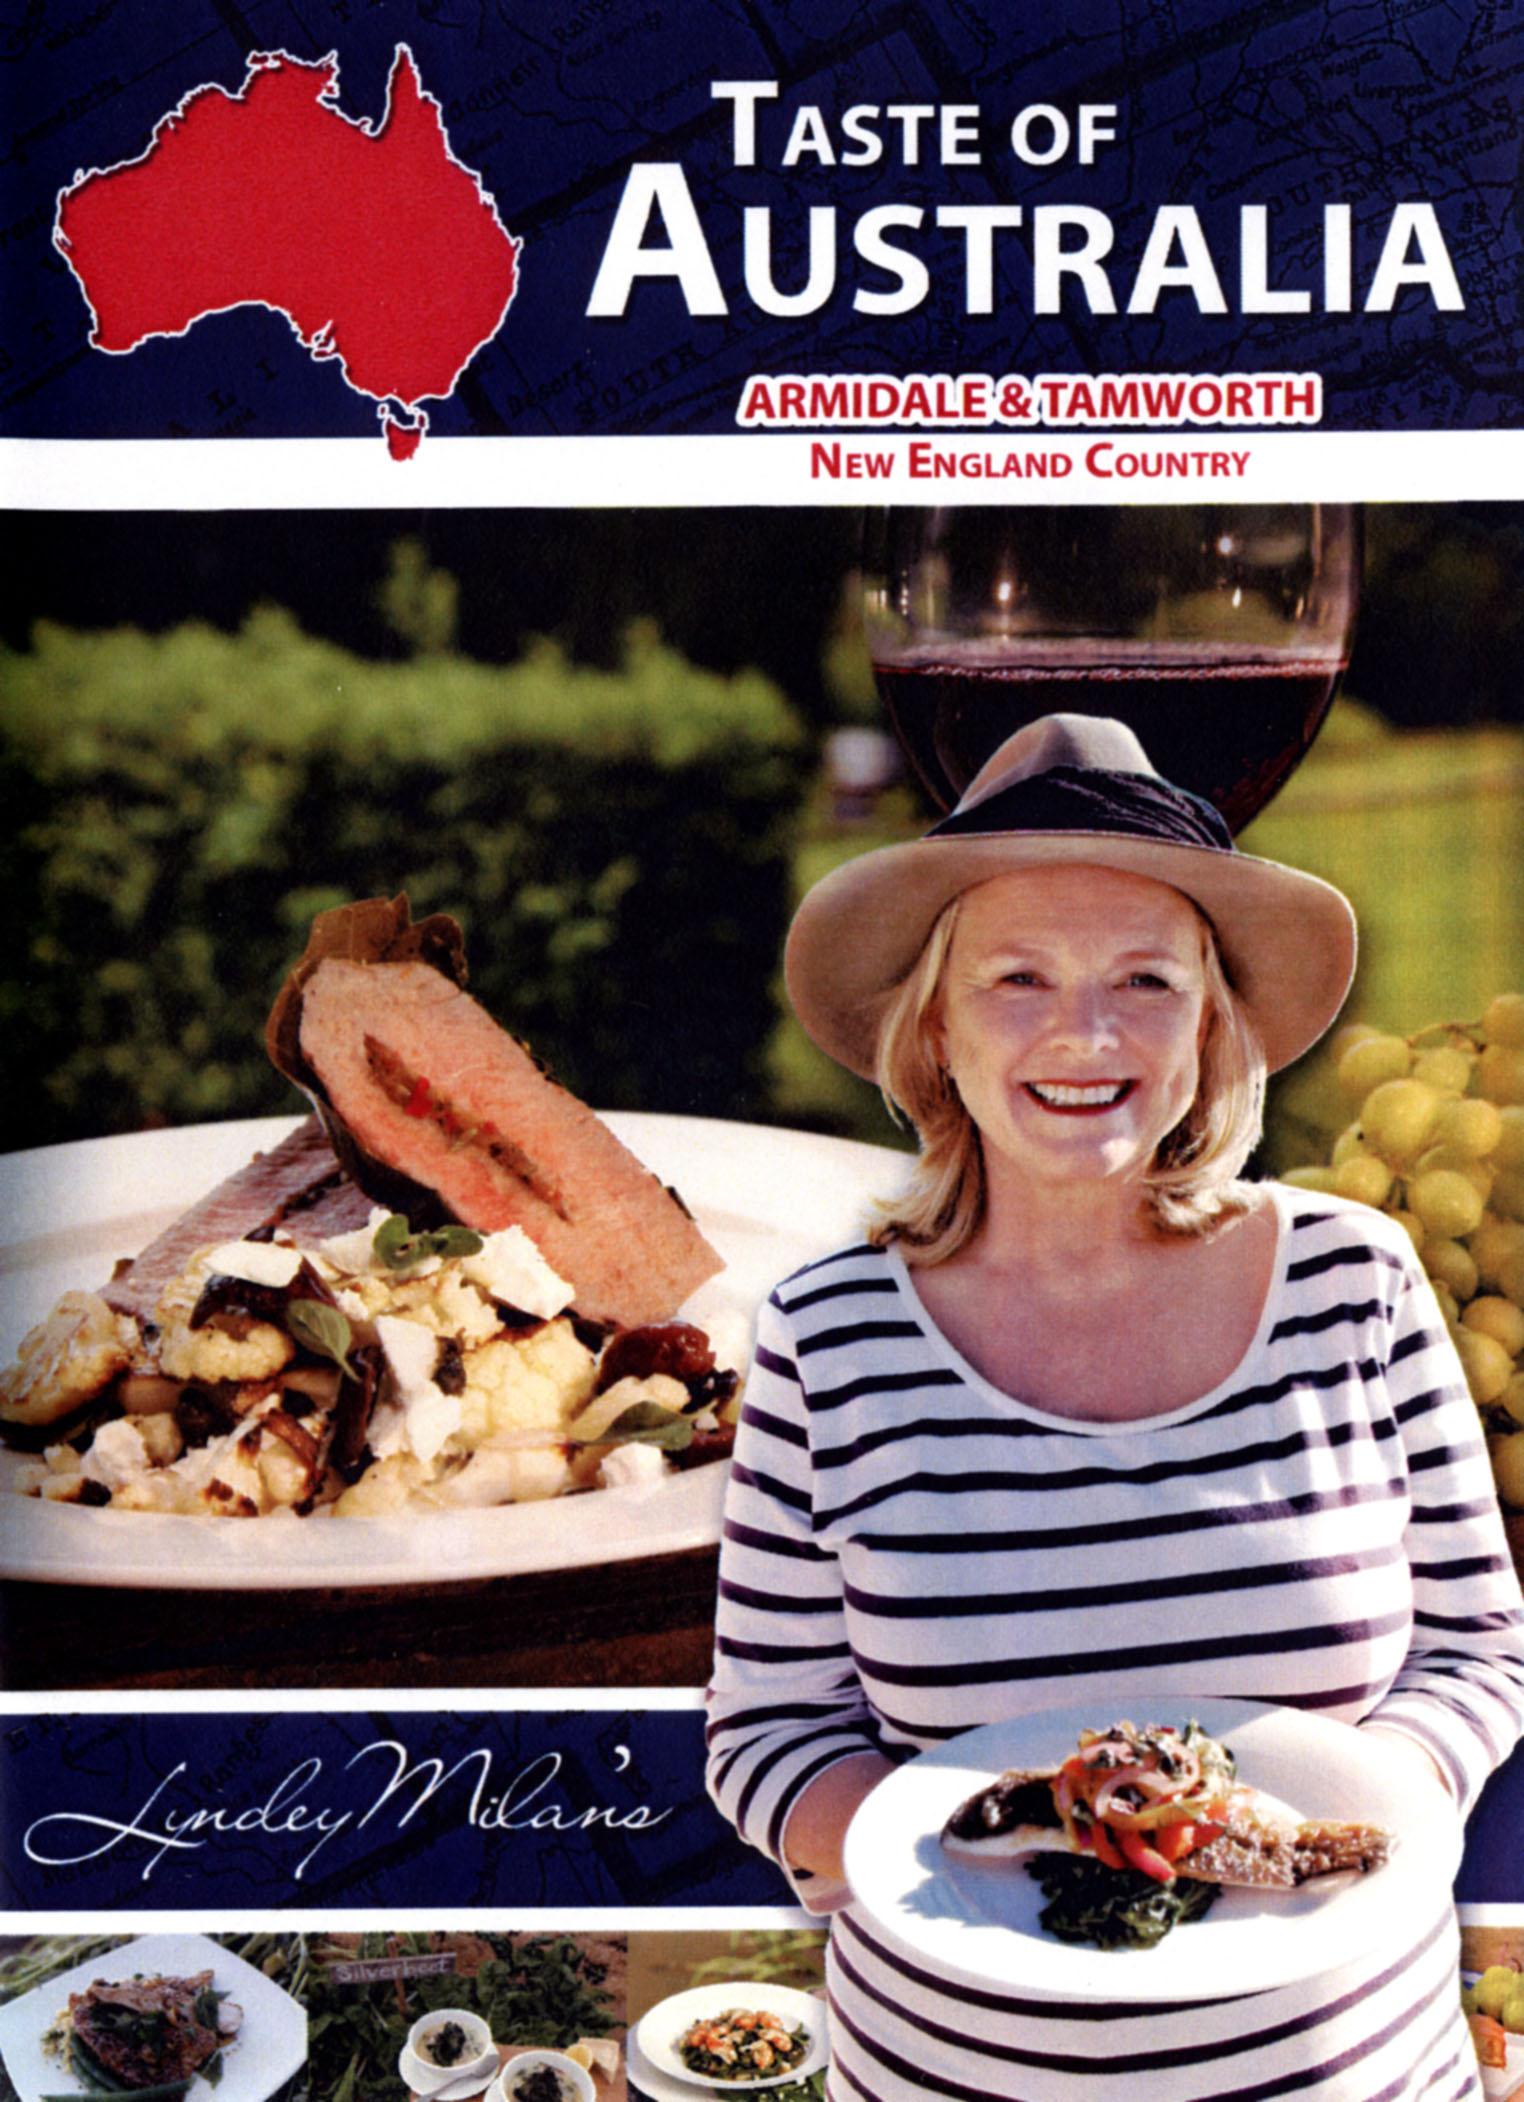 Taste of Australia: Armidale & Tamworth - New England Country